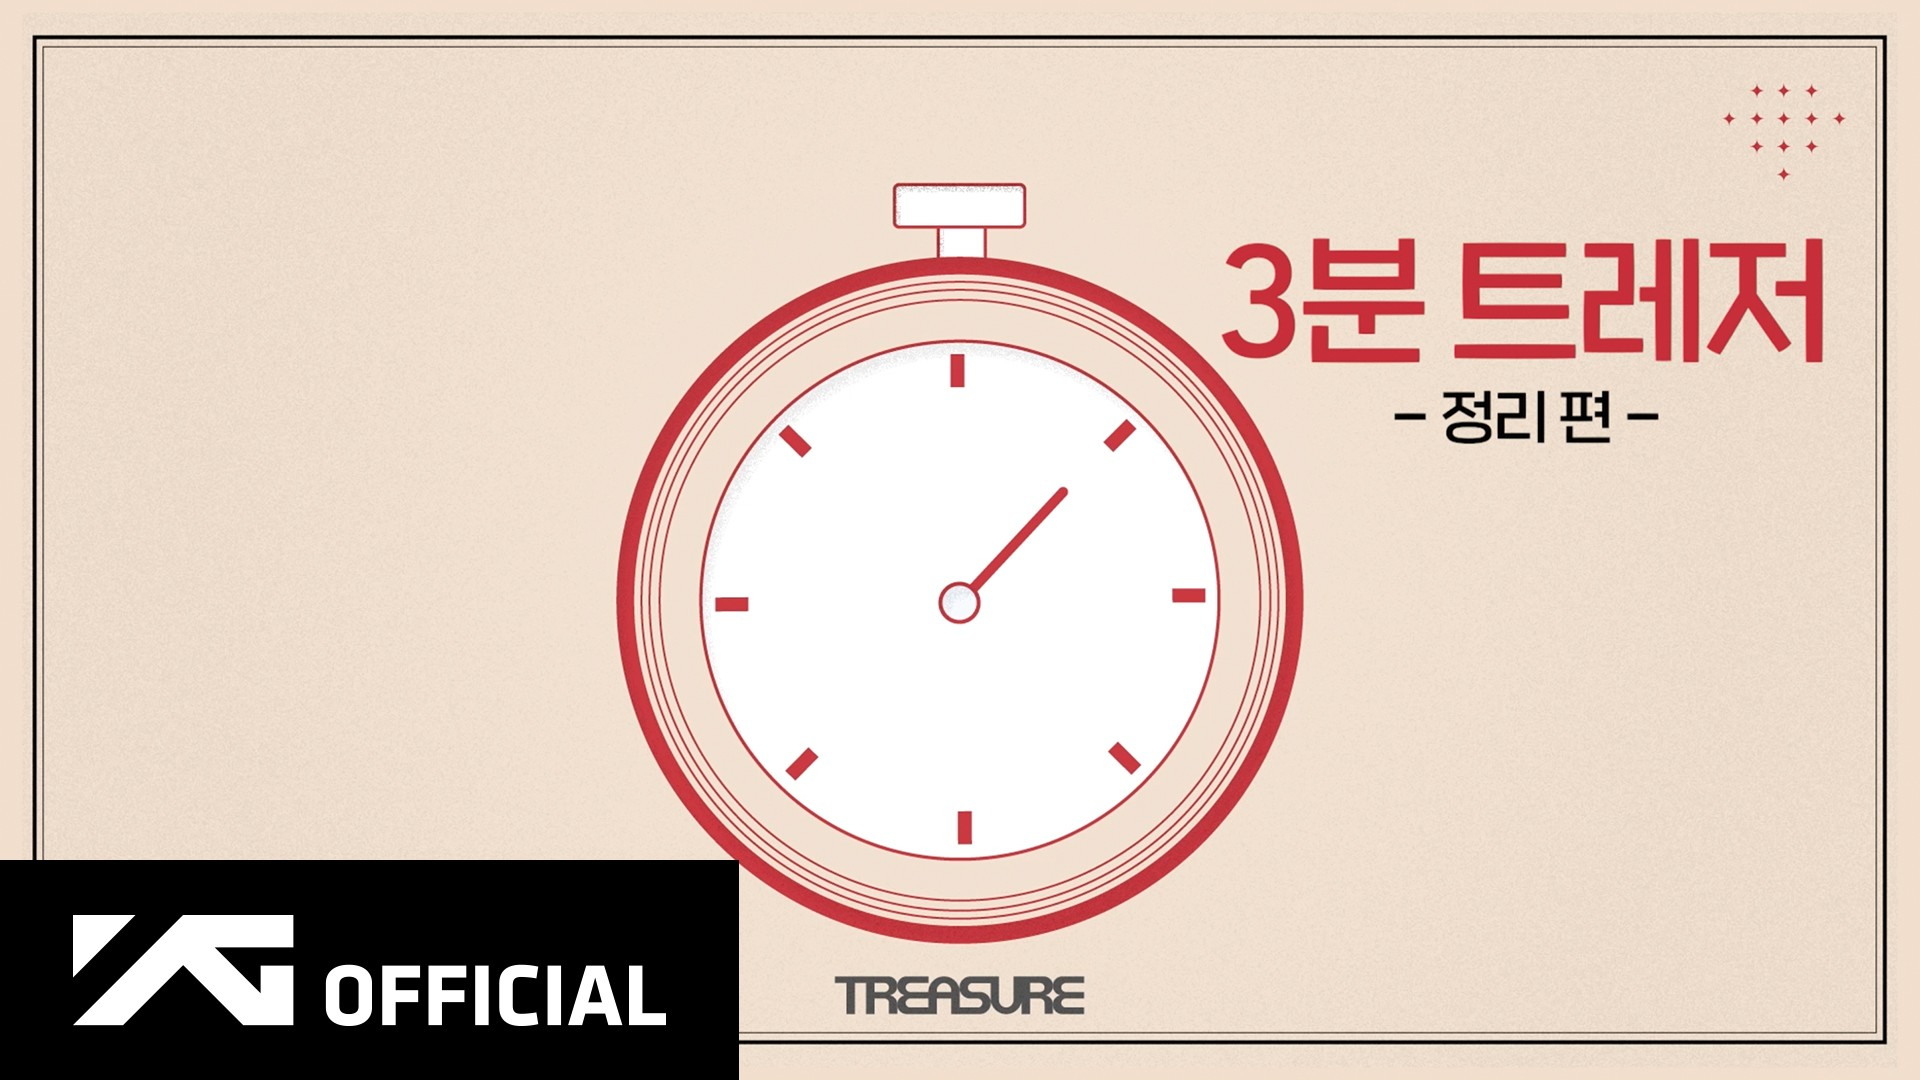 TREASURE - 3분 트레저 🧹 정리편